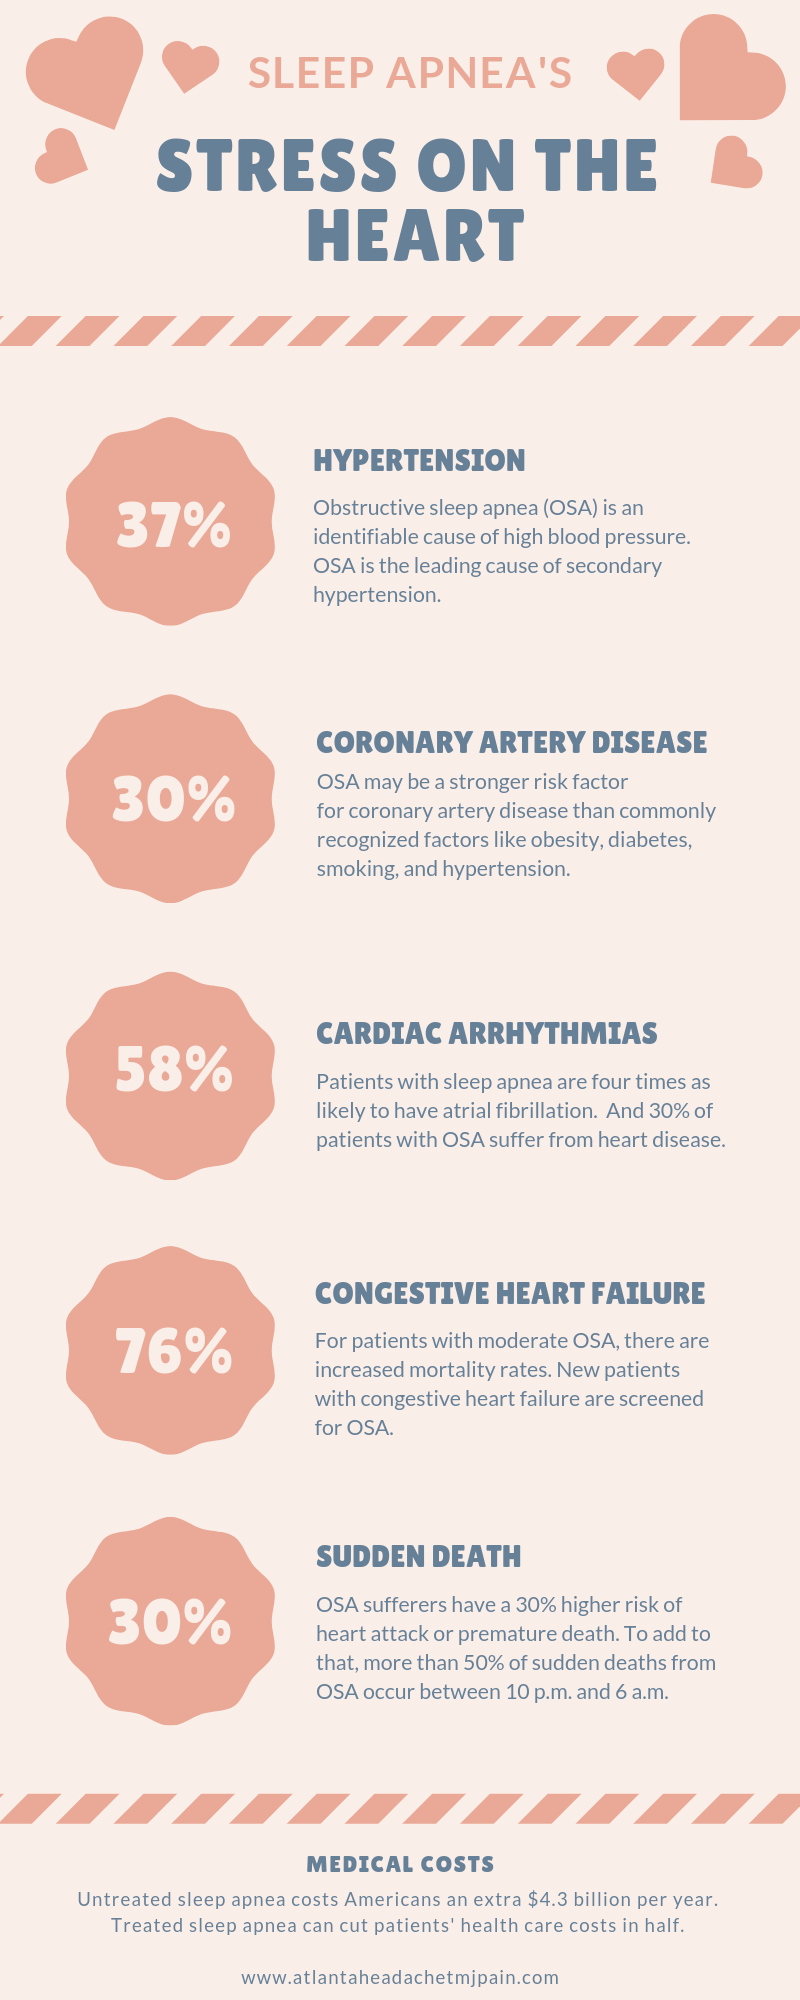 Sleep apnea's stress on the heart: An infographic |